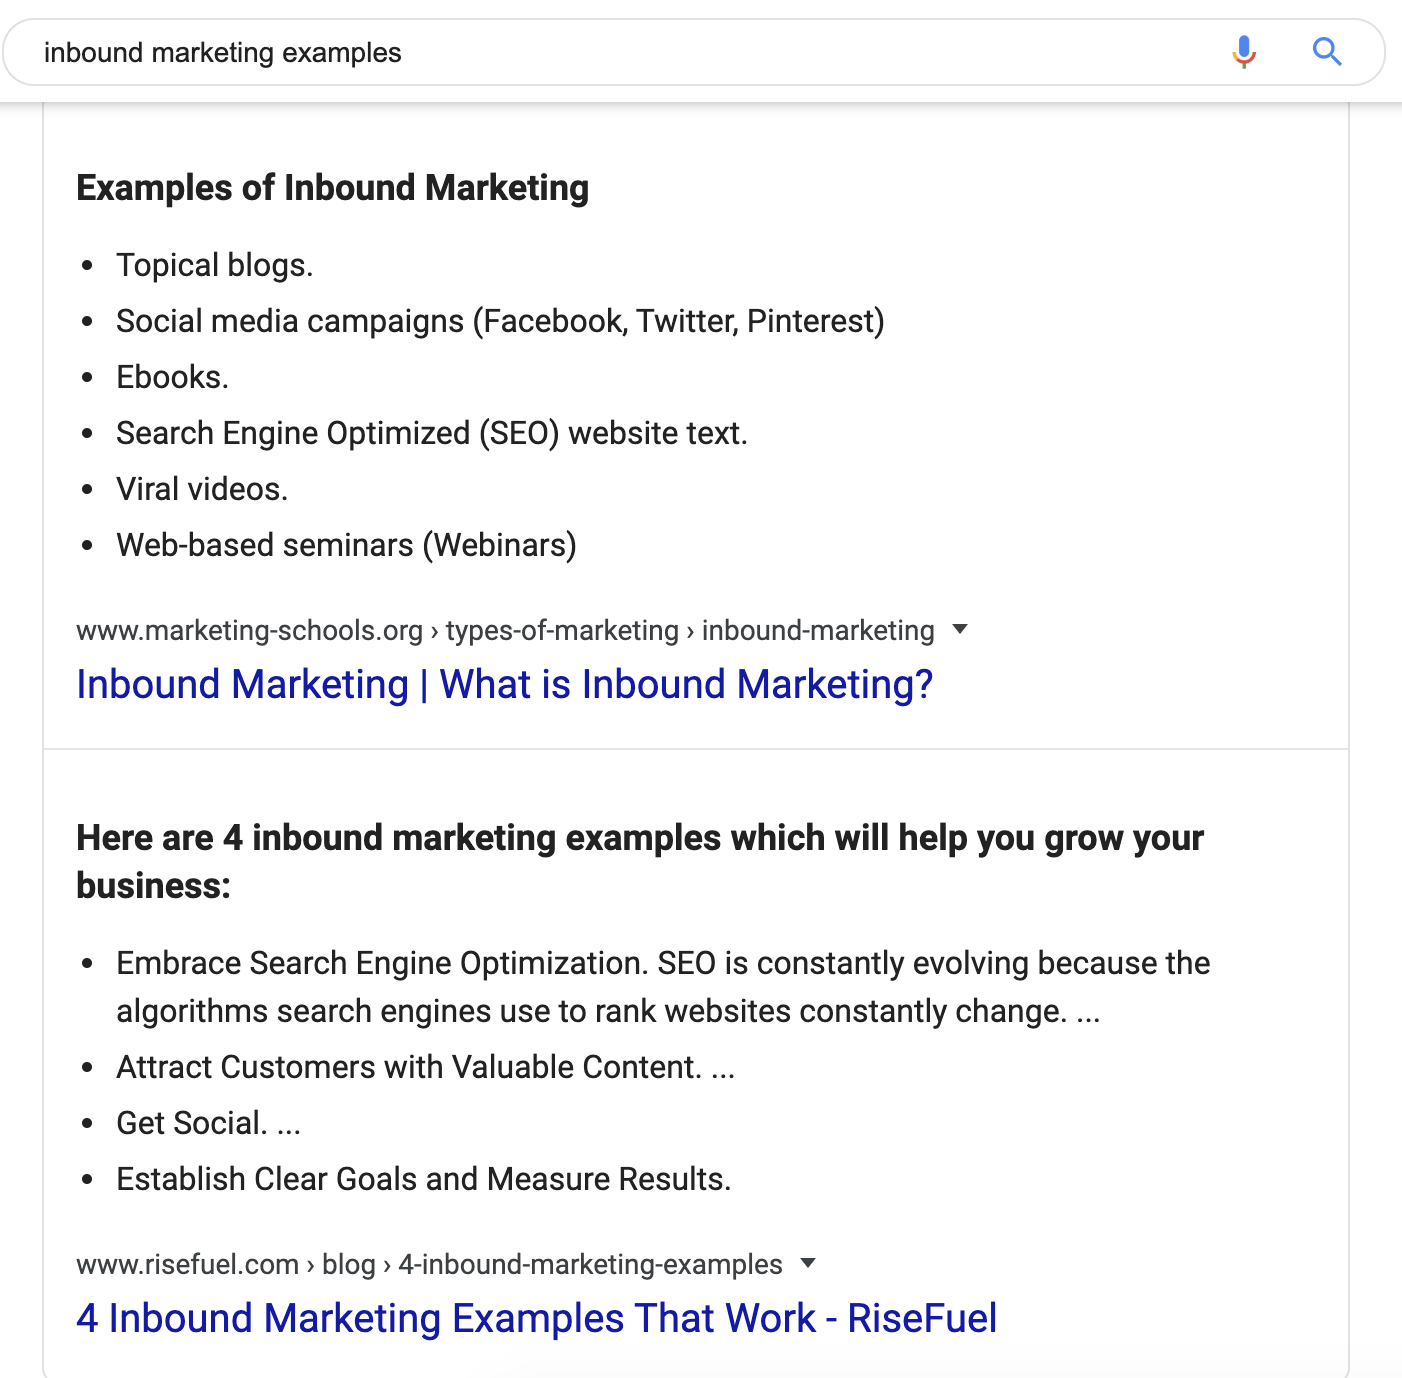 inbound marketing examples